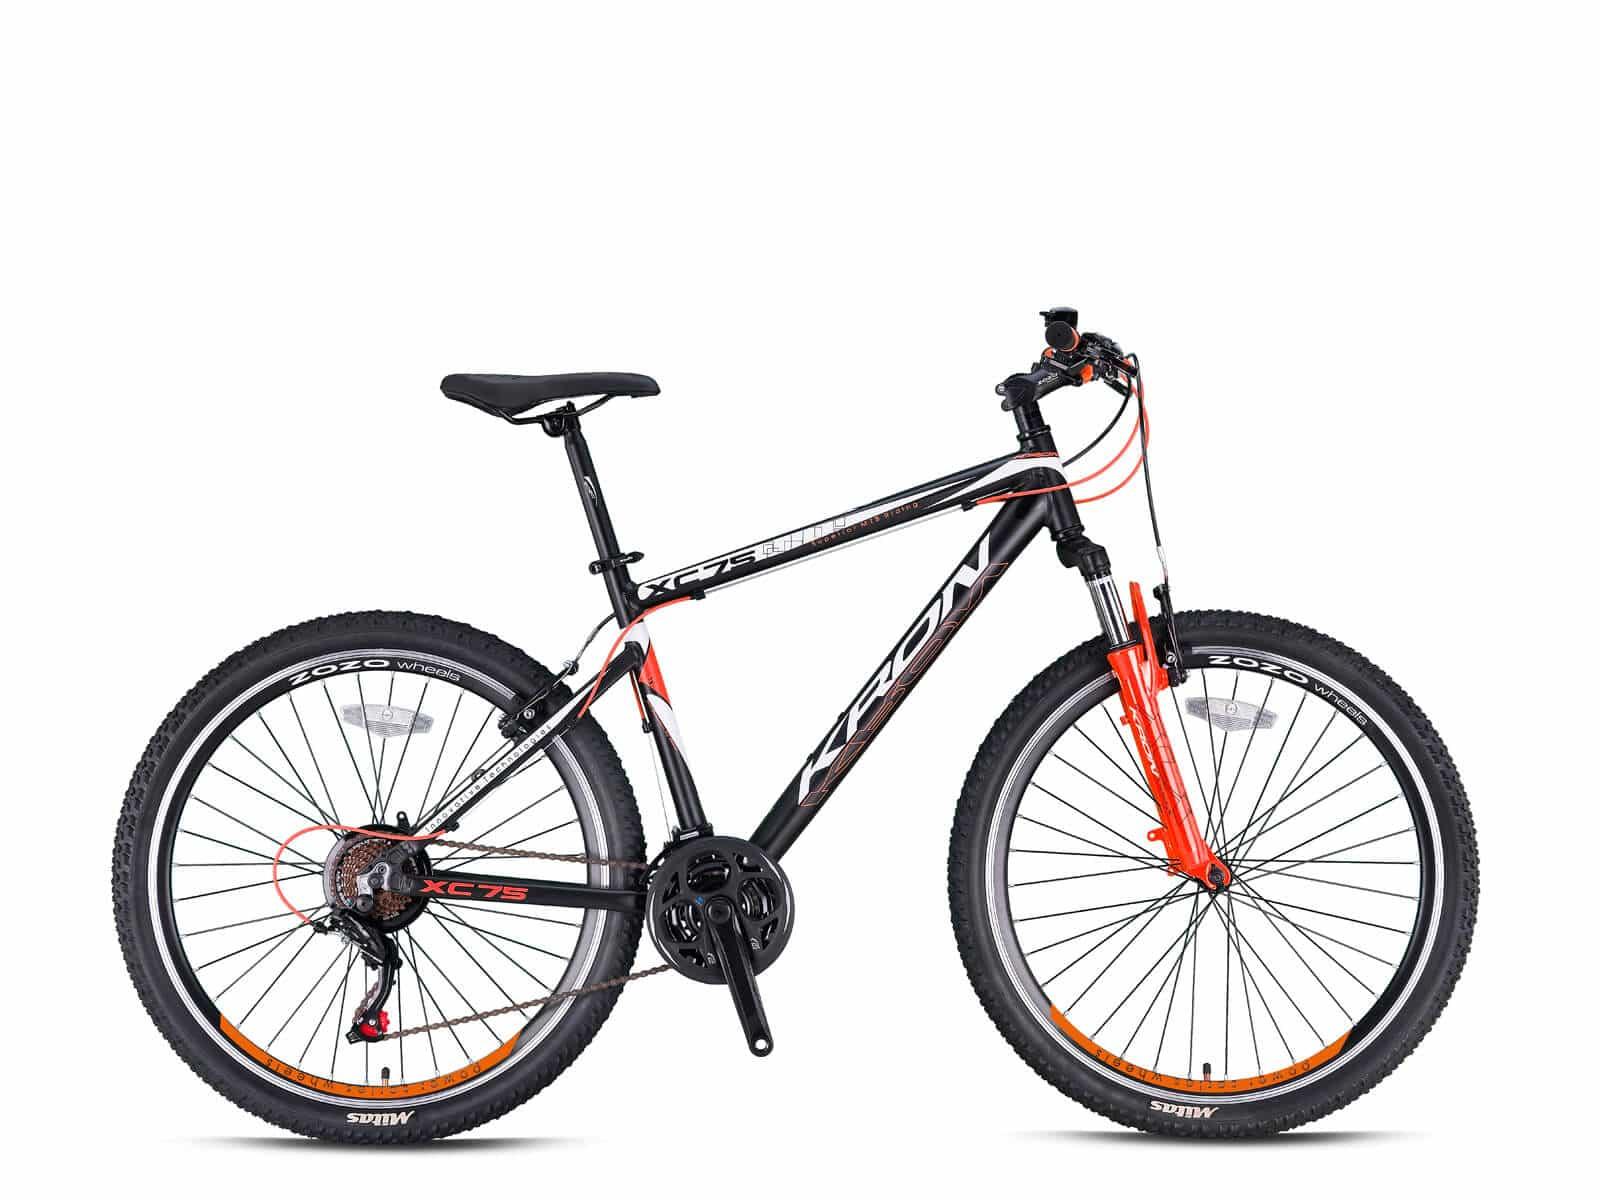 Kron Ποδήλατο XC75 - Ποδήλατα Βουνού / MTB